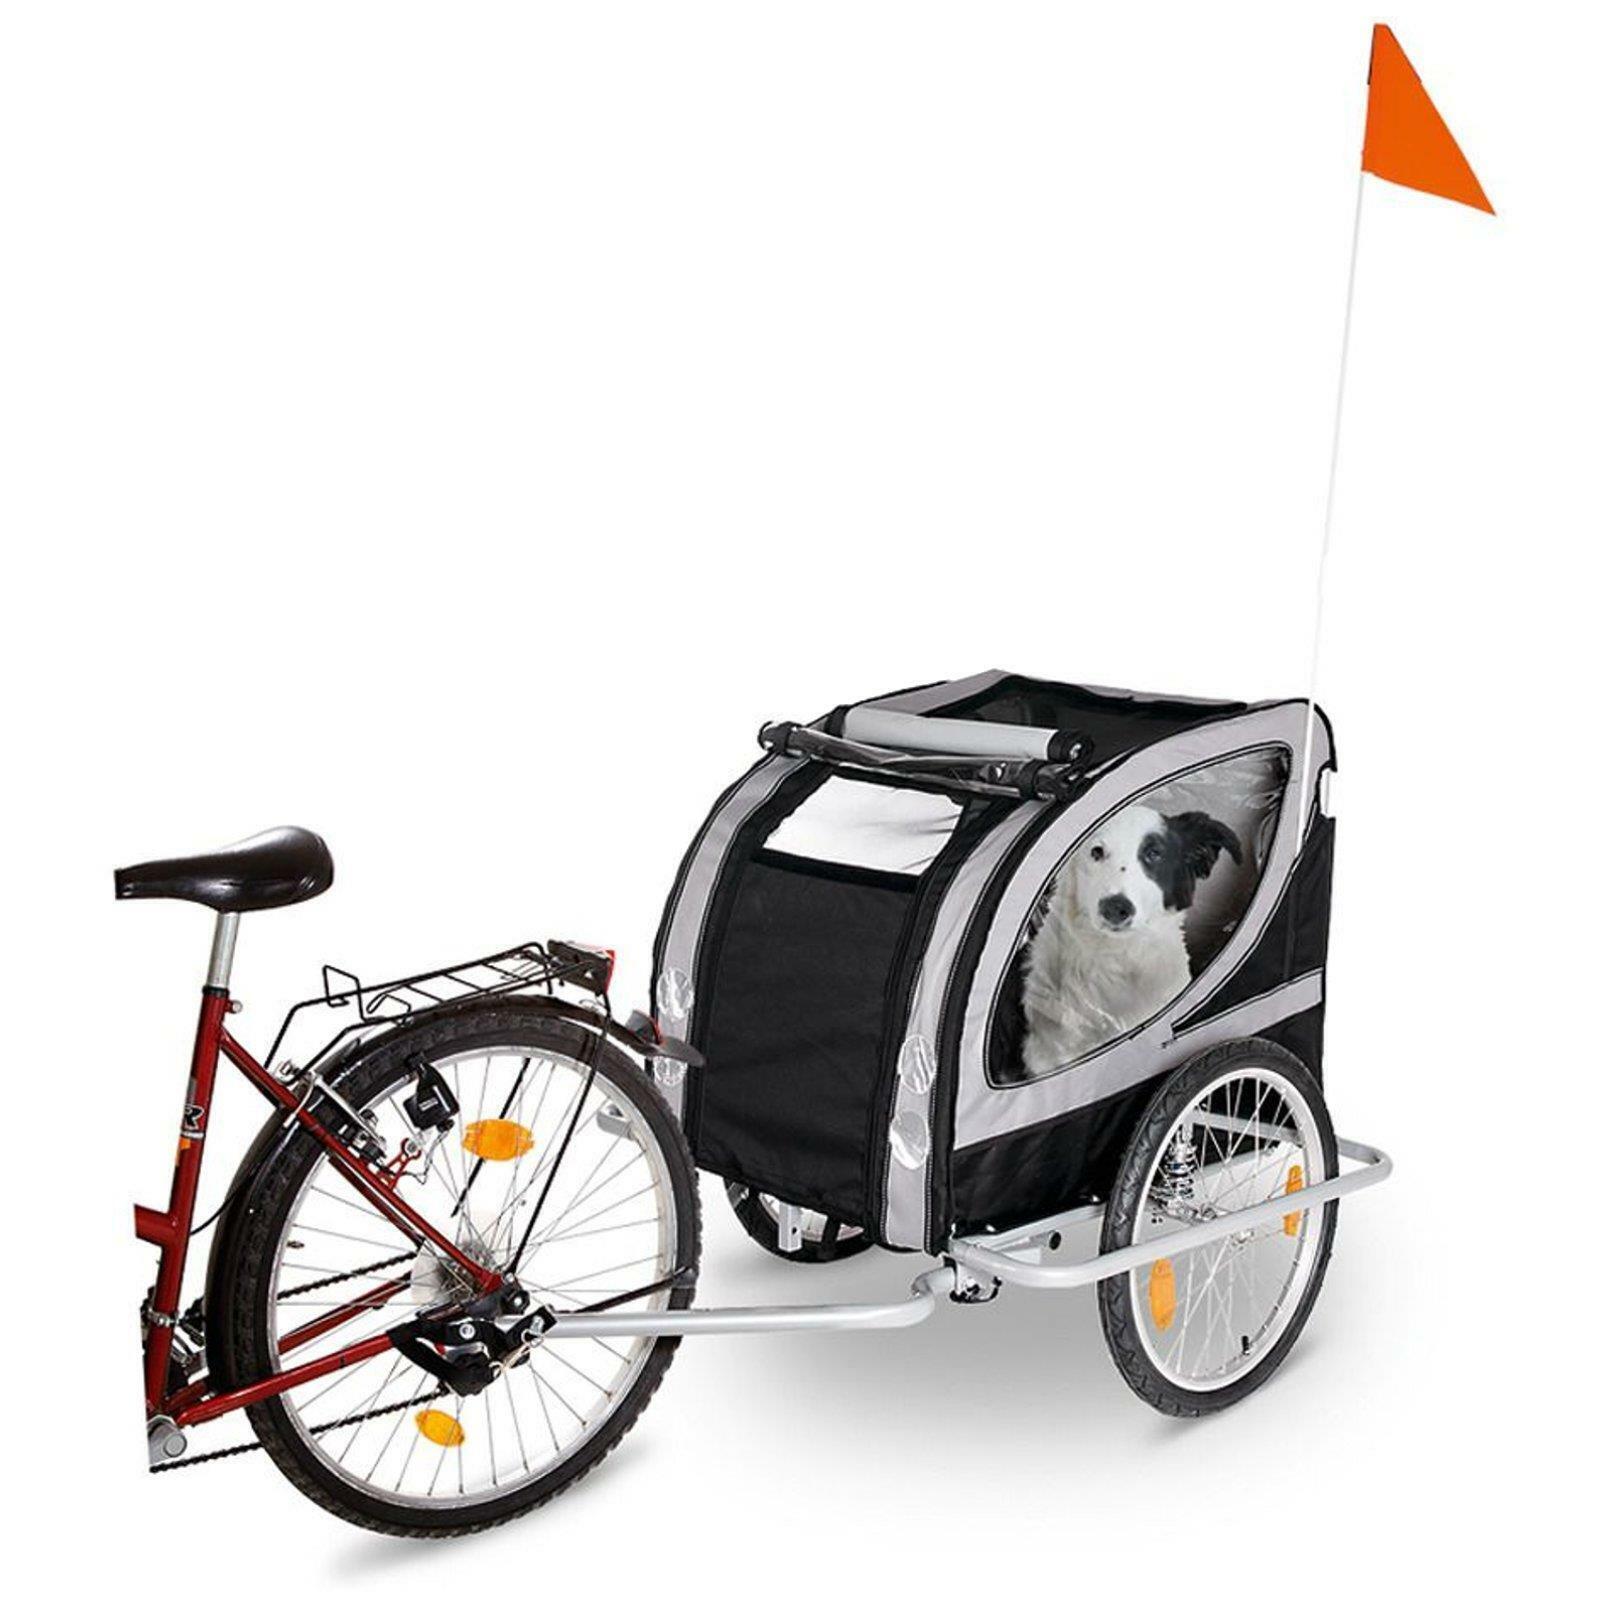 Karlie Doggy Liner Paris De Luxe Fahrrad Anhänger Hundeanhänger Grau Schwarz